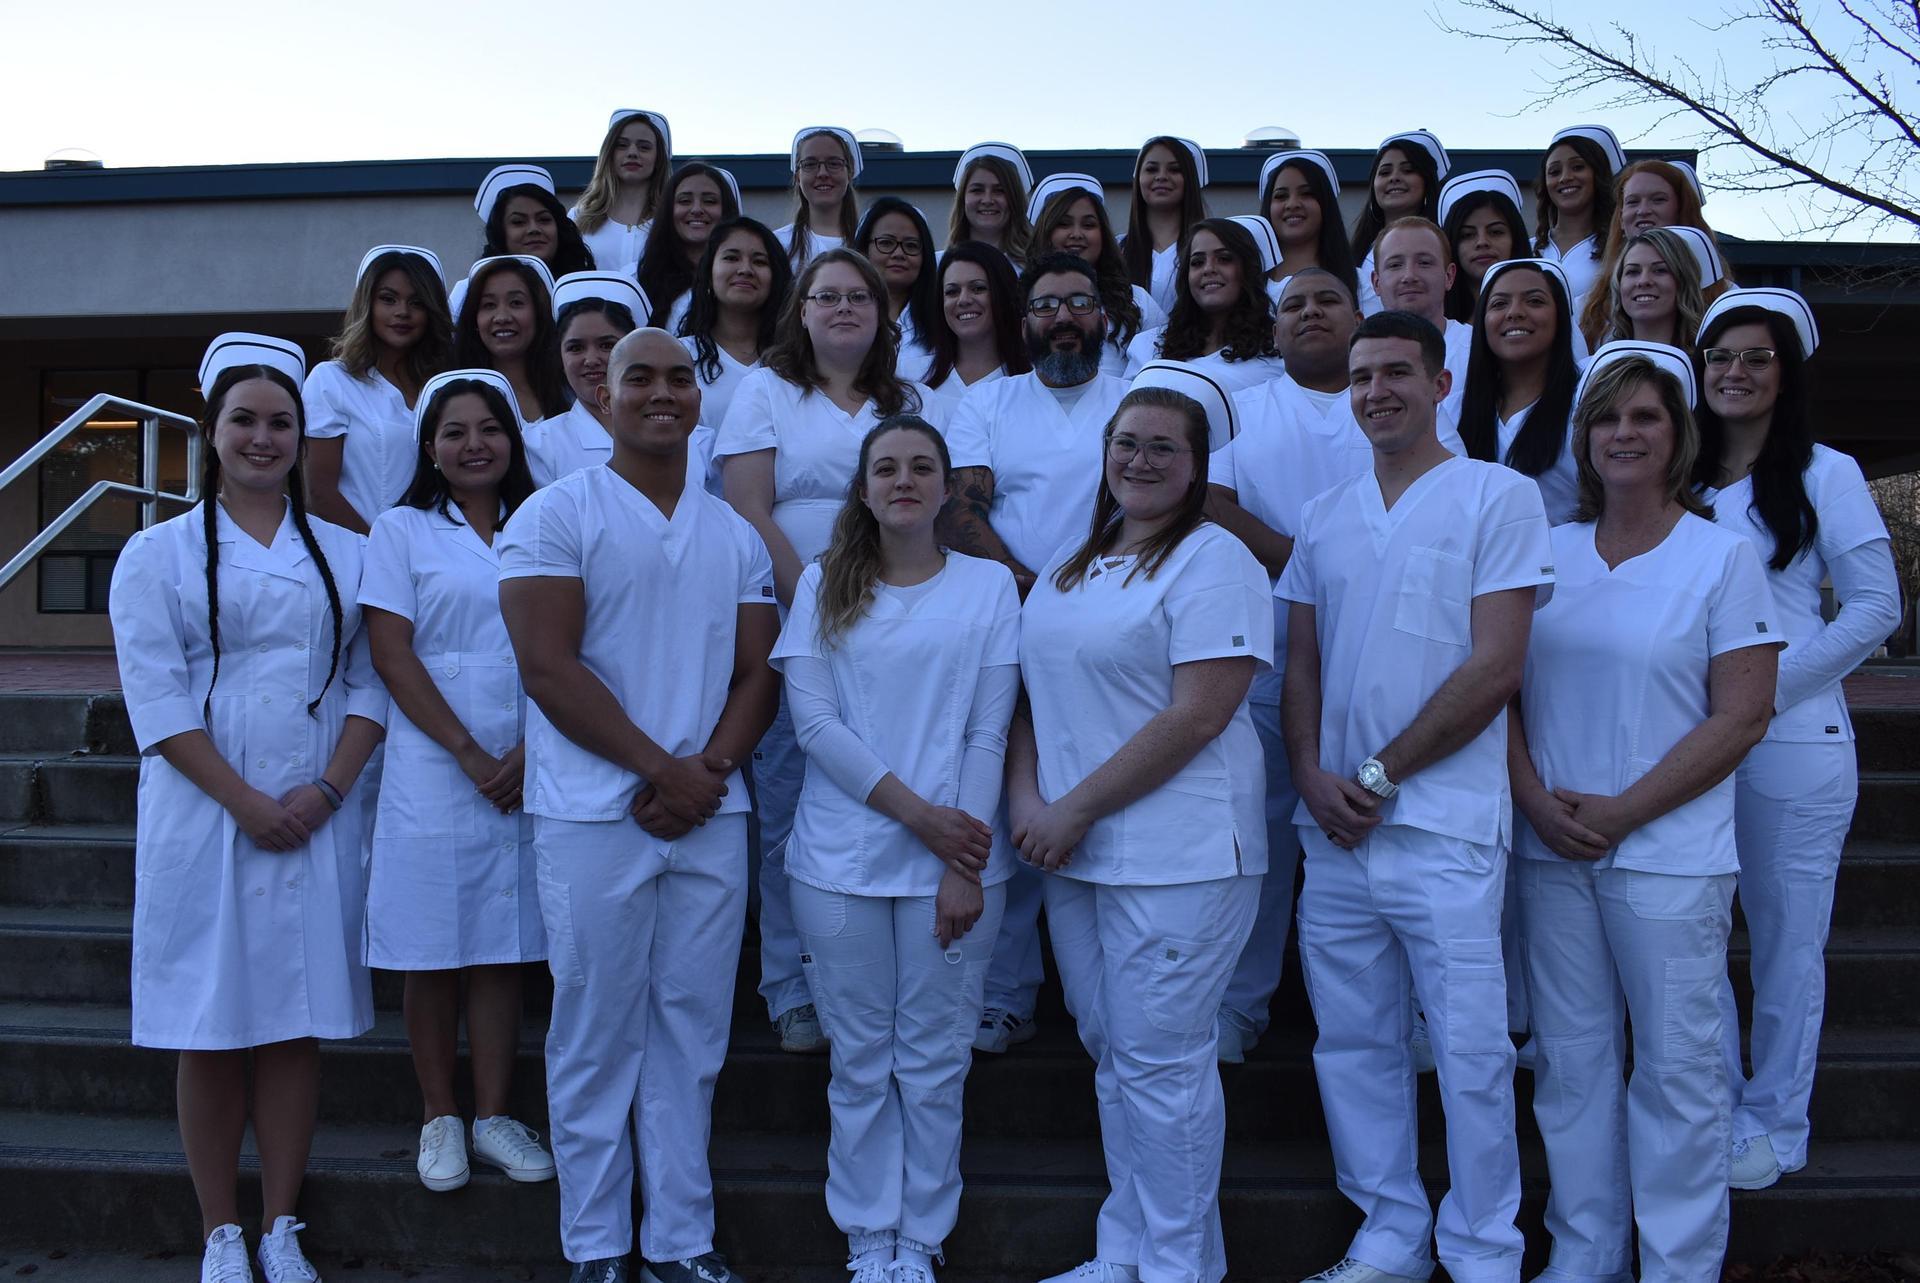 Graduating Class of 2019 - UAS